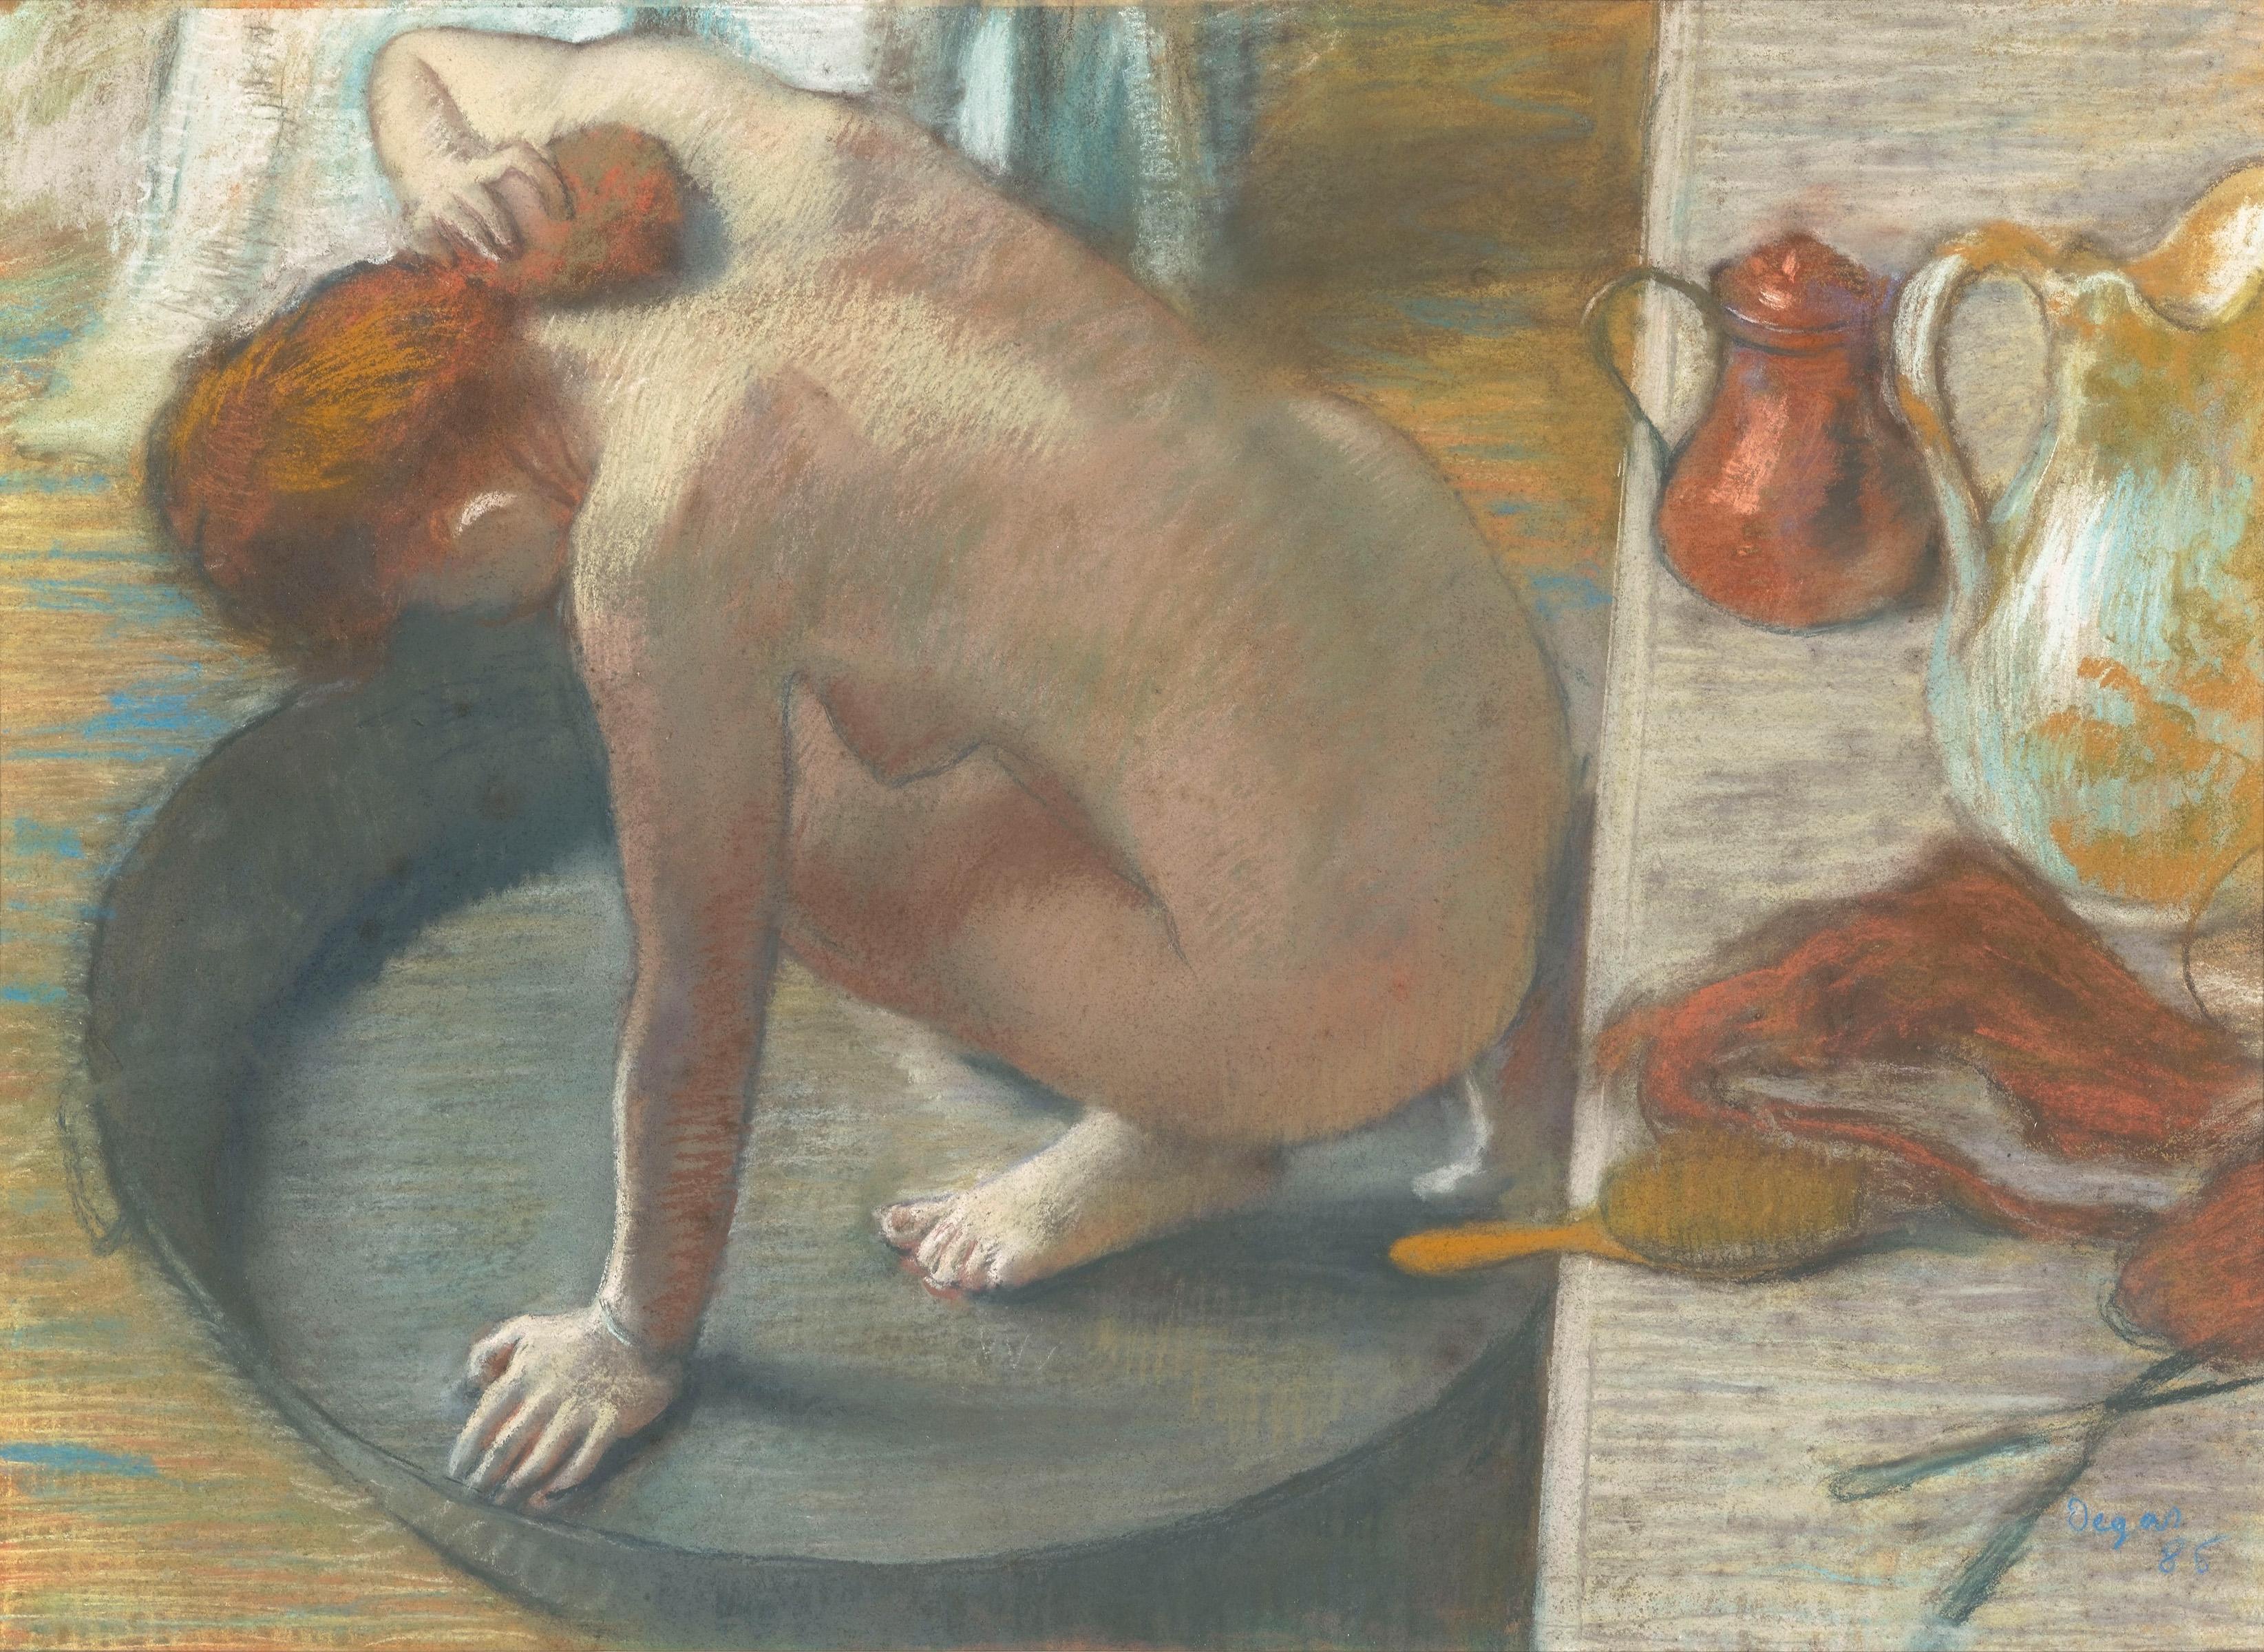 Edgar_Germain_Hilaire_Degas_031.jpg